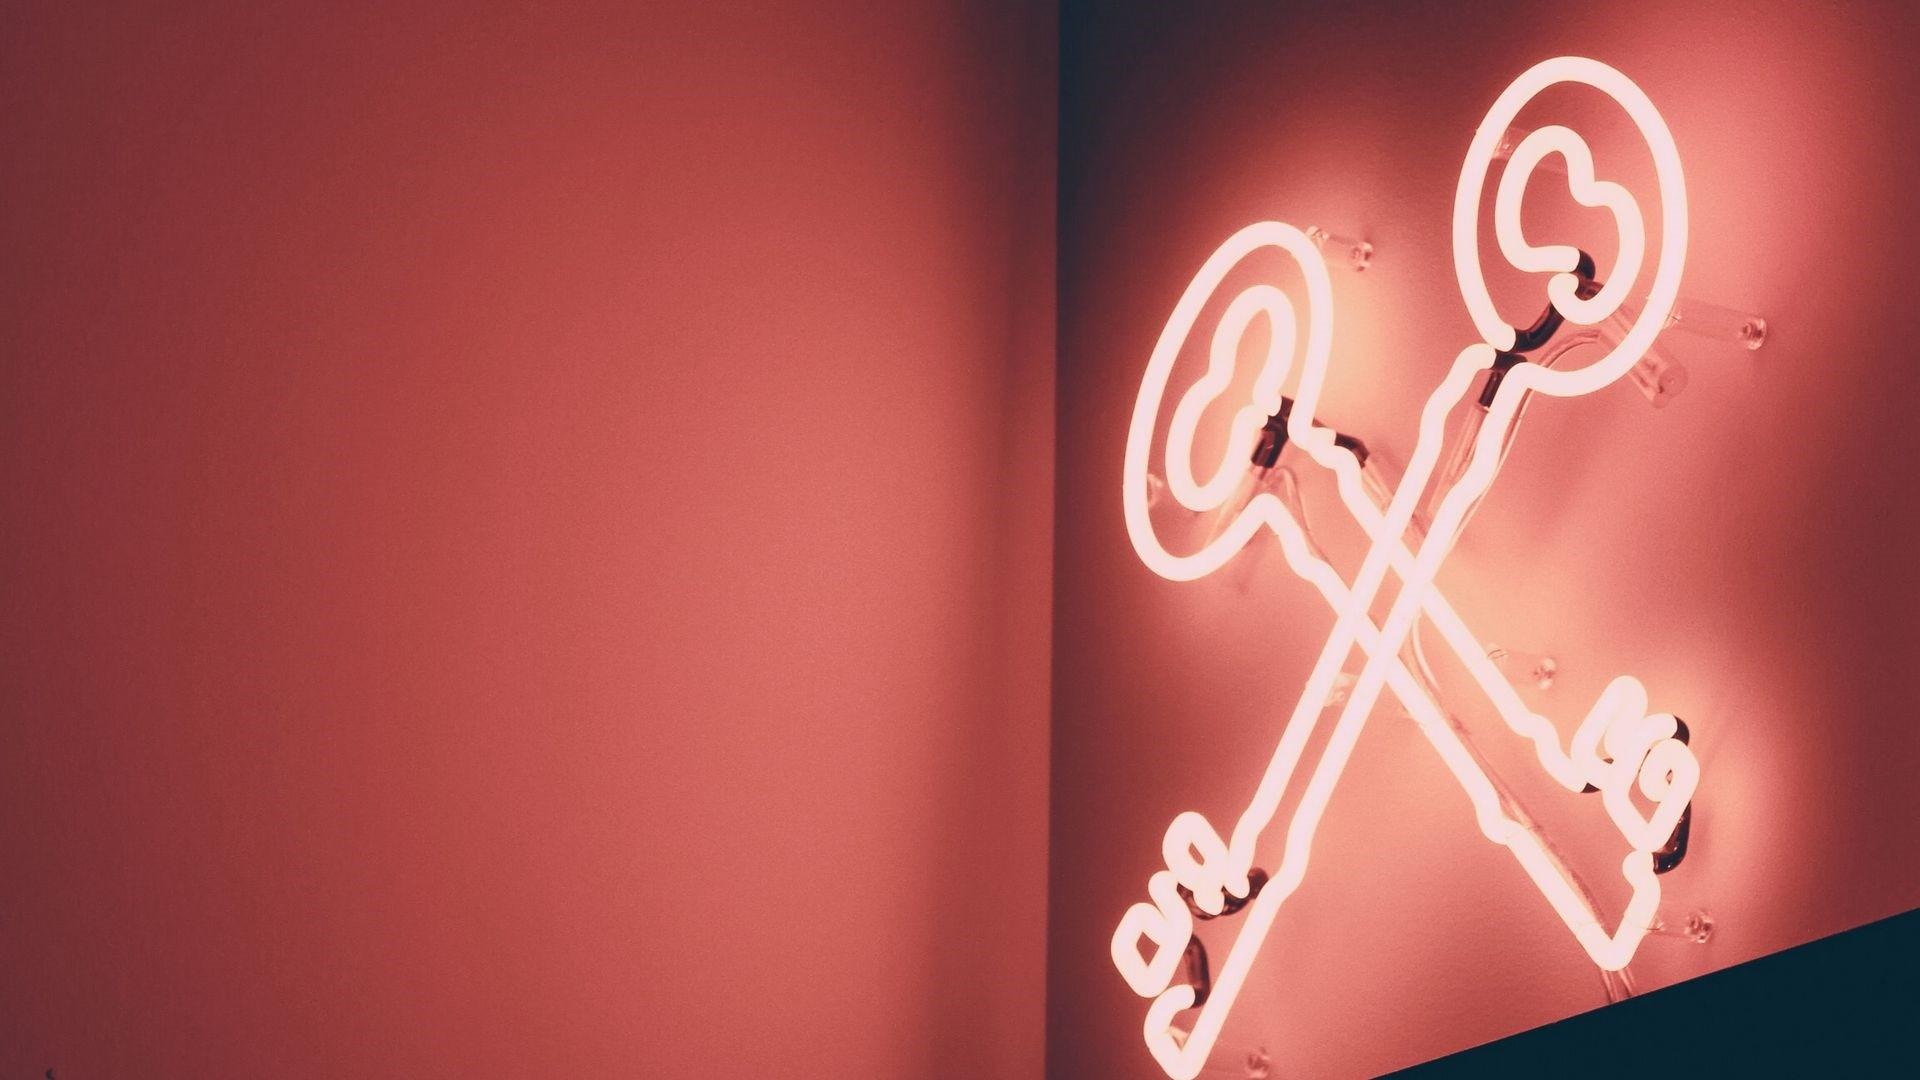 Neon Sign HD Wallpaper